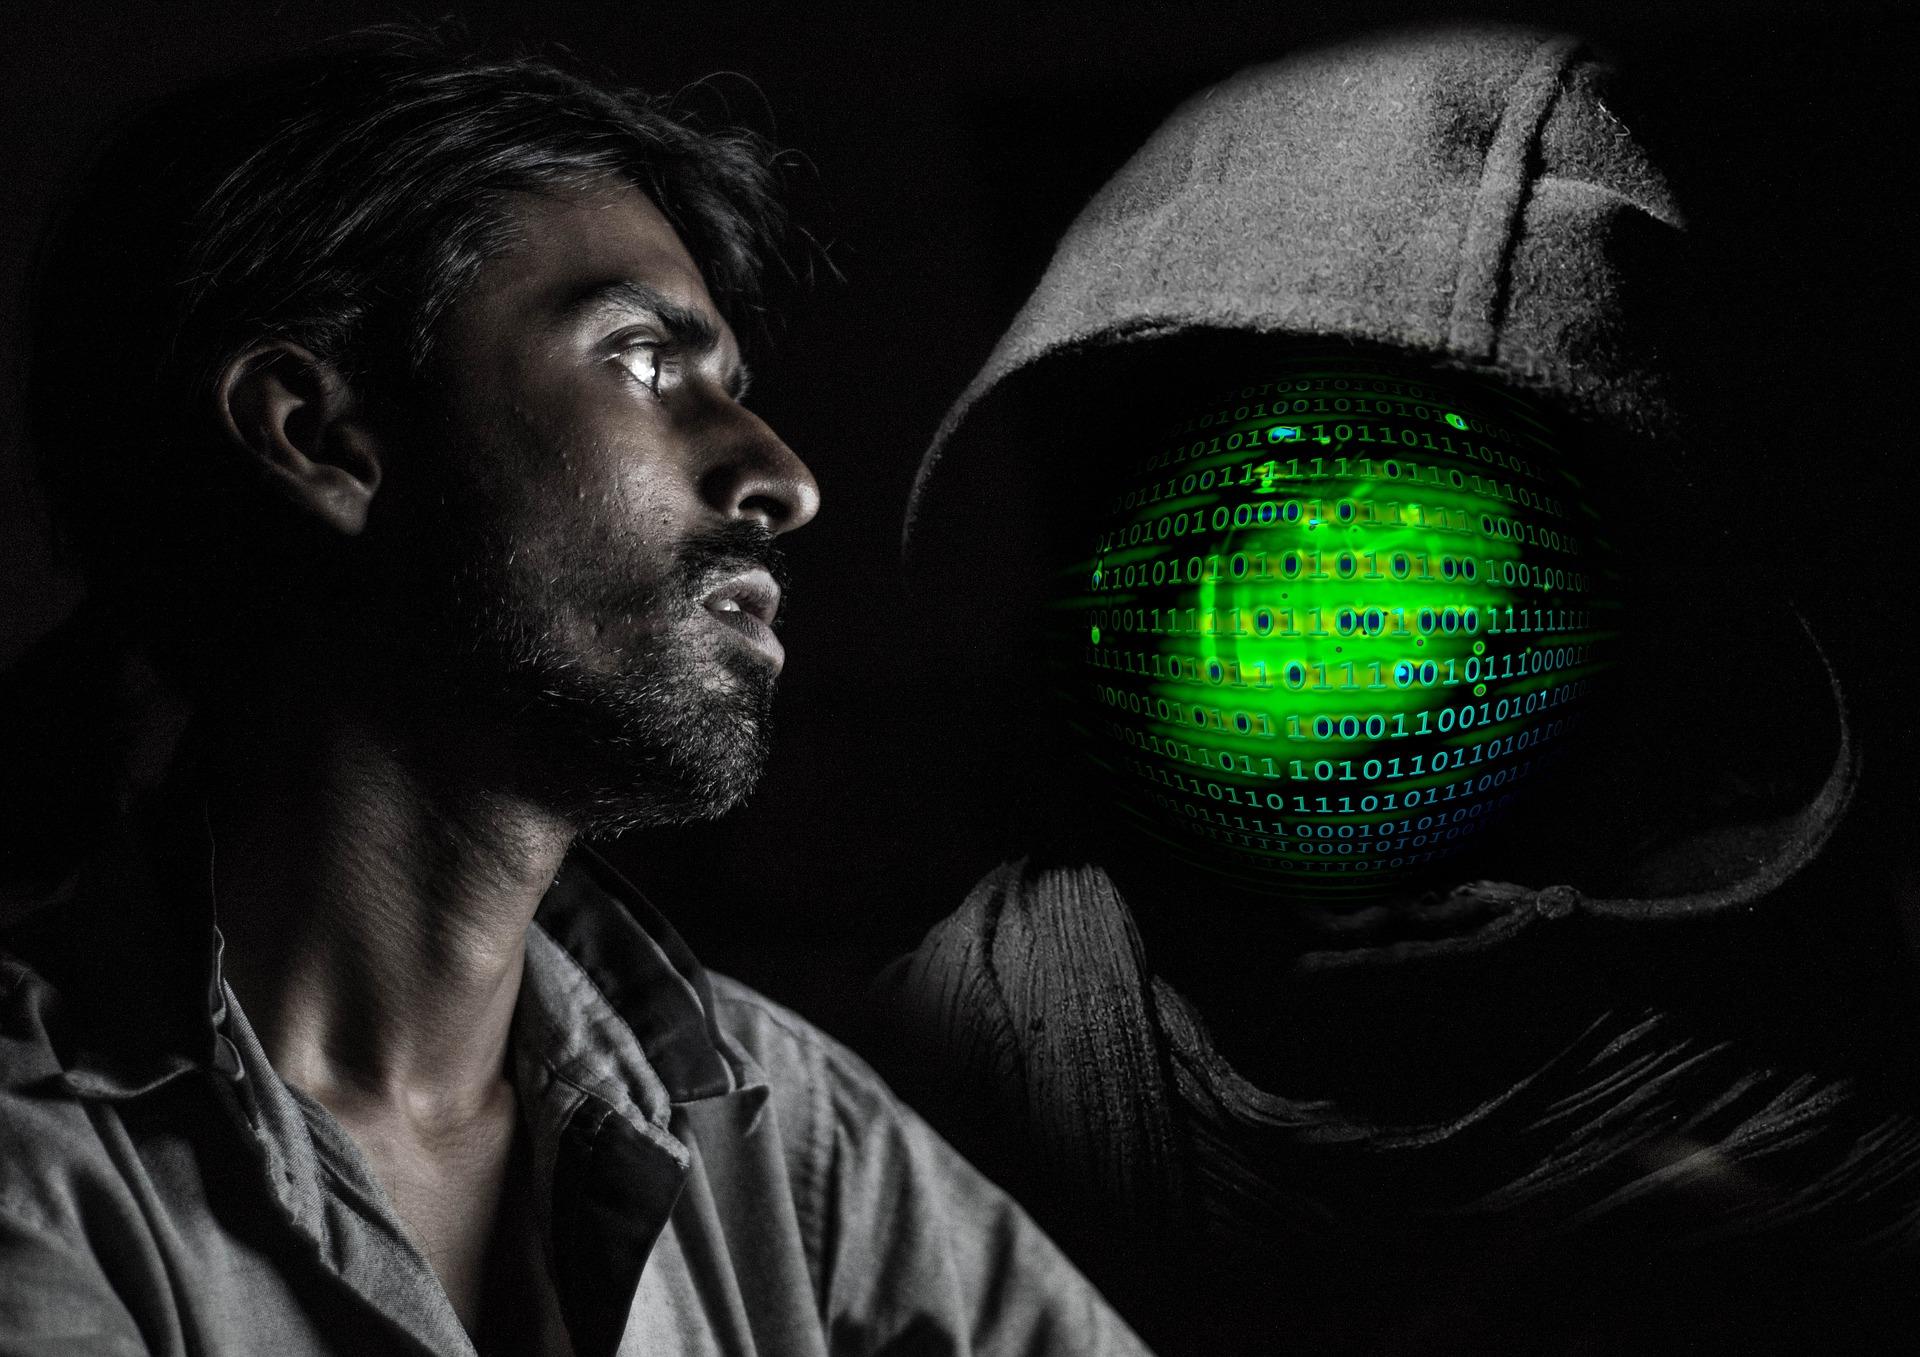 safemoon, hackex